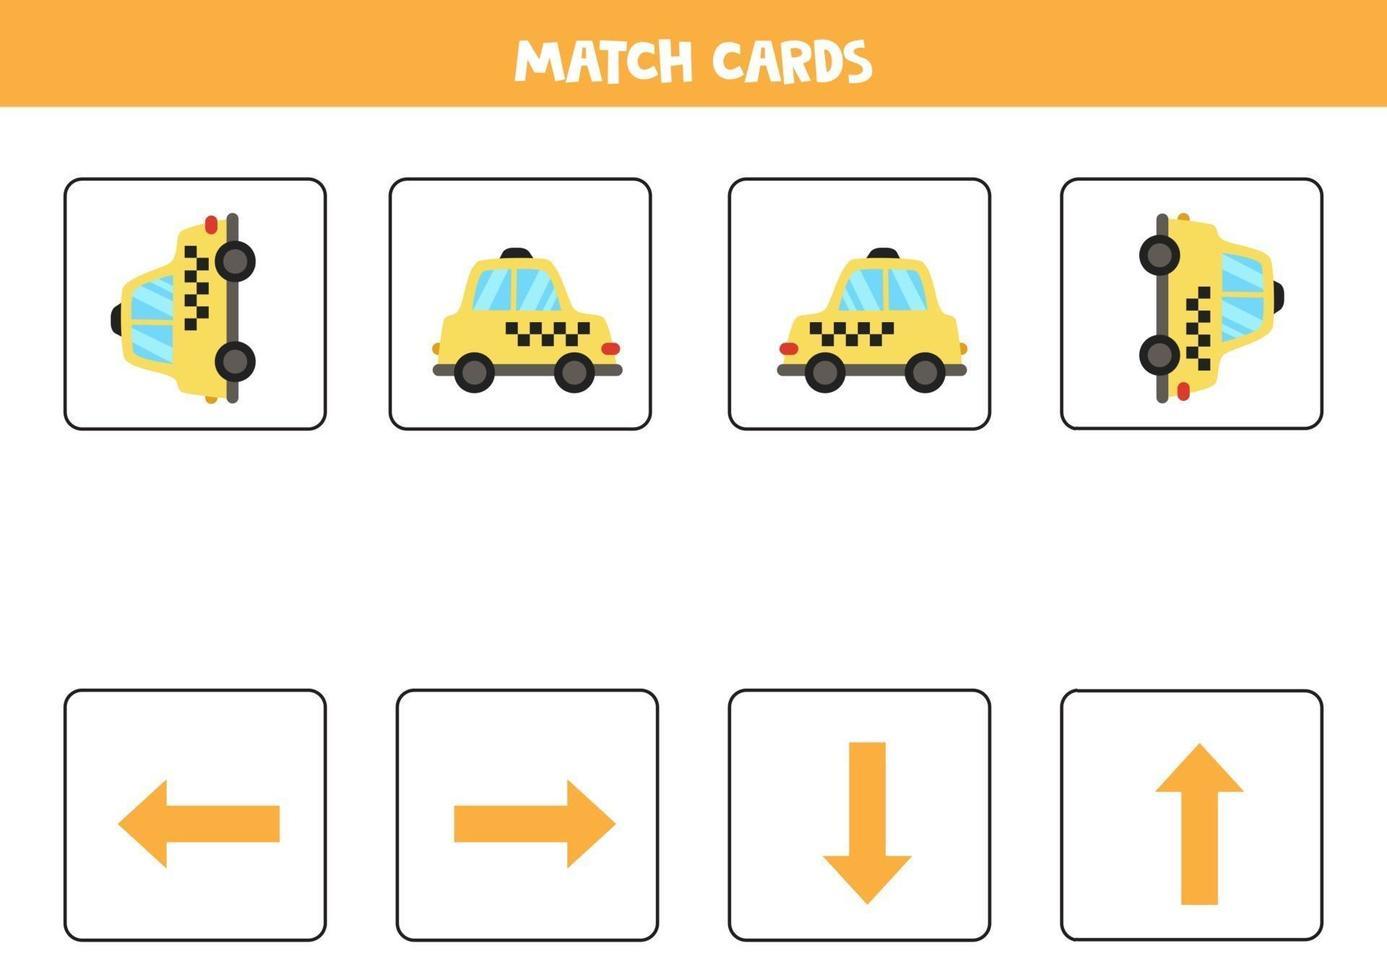 izquierda, derecha, arriba o abajo. Orientación espacial con taxi de dibujos animados. vector